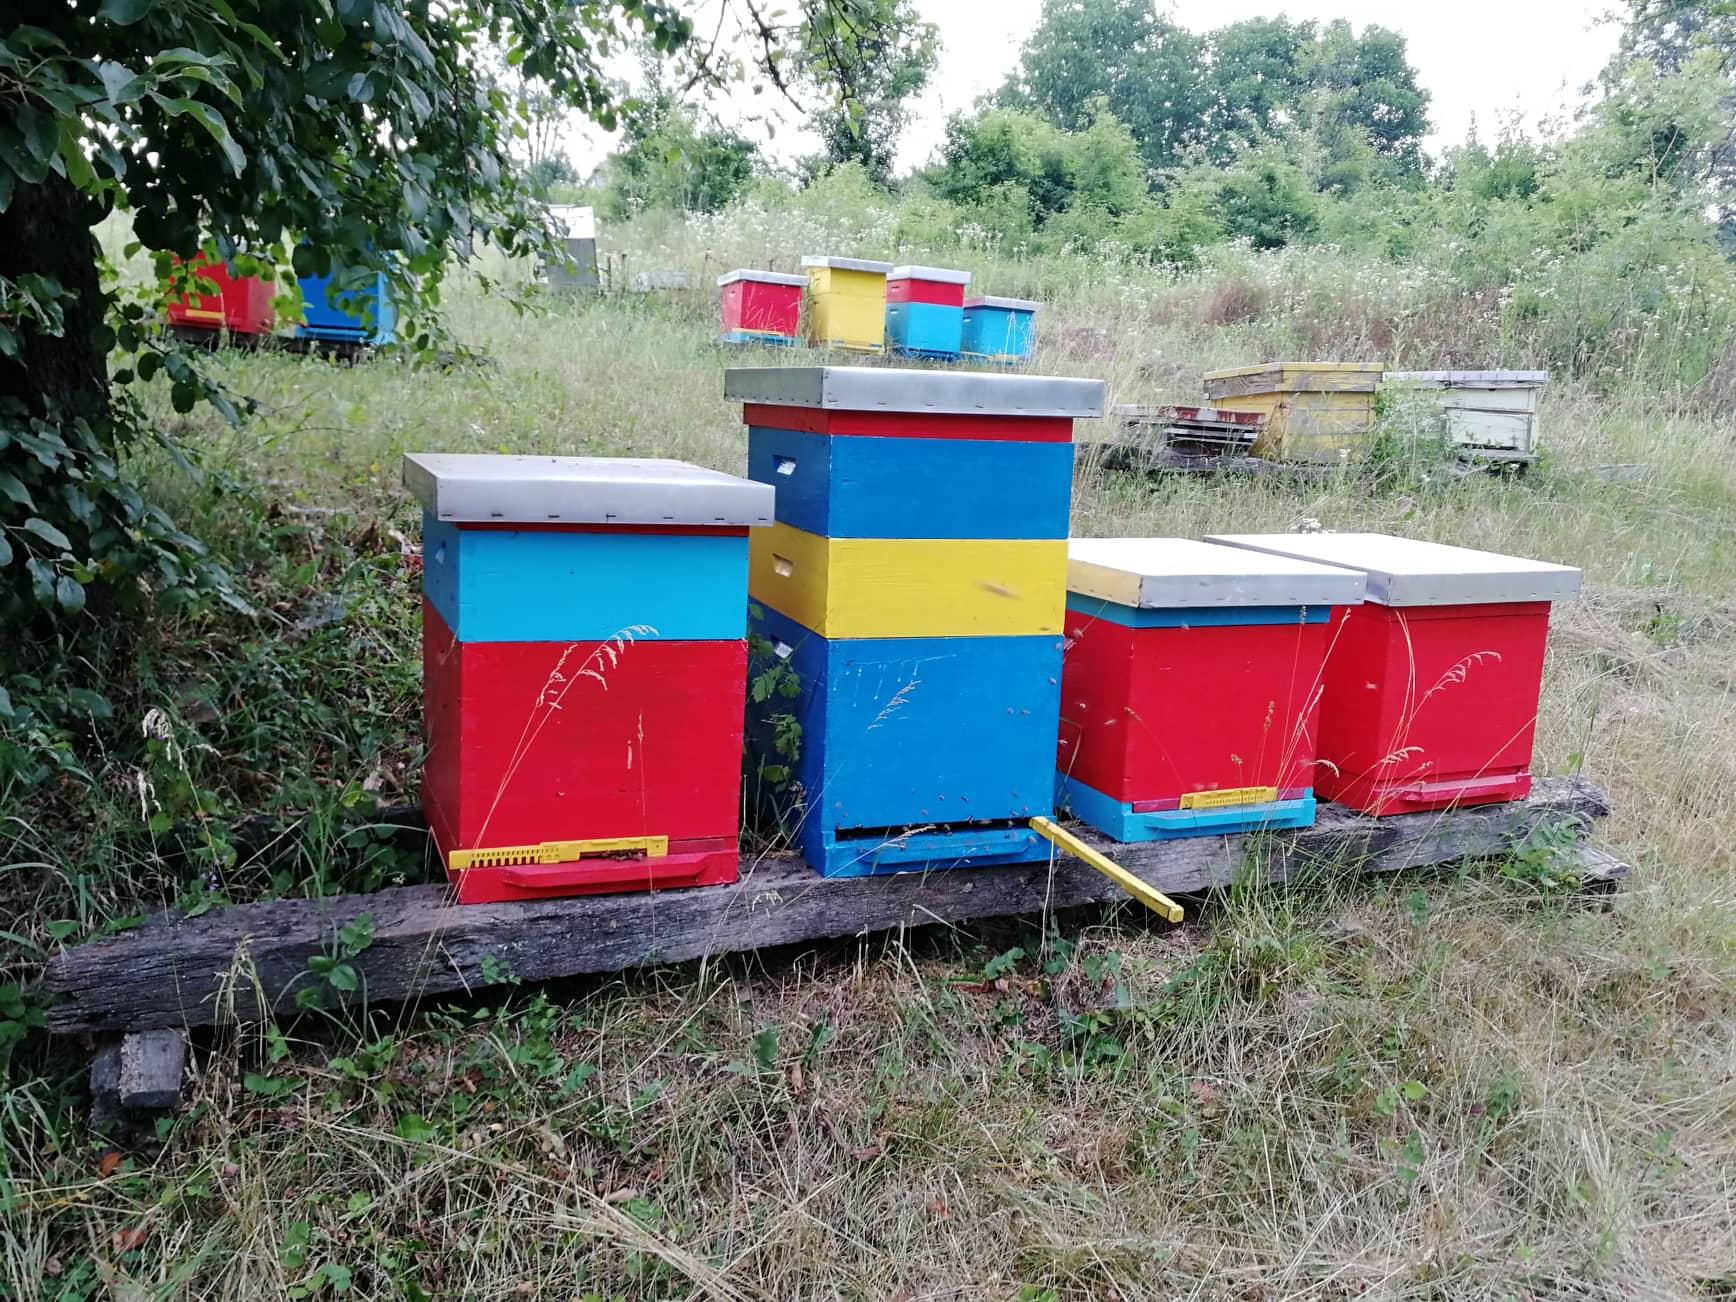 Ilustracija: Pčelinjak Vladana Milićevica, foto: Domaćinska kuća